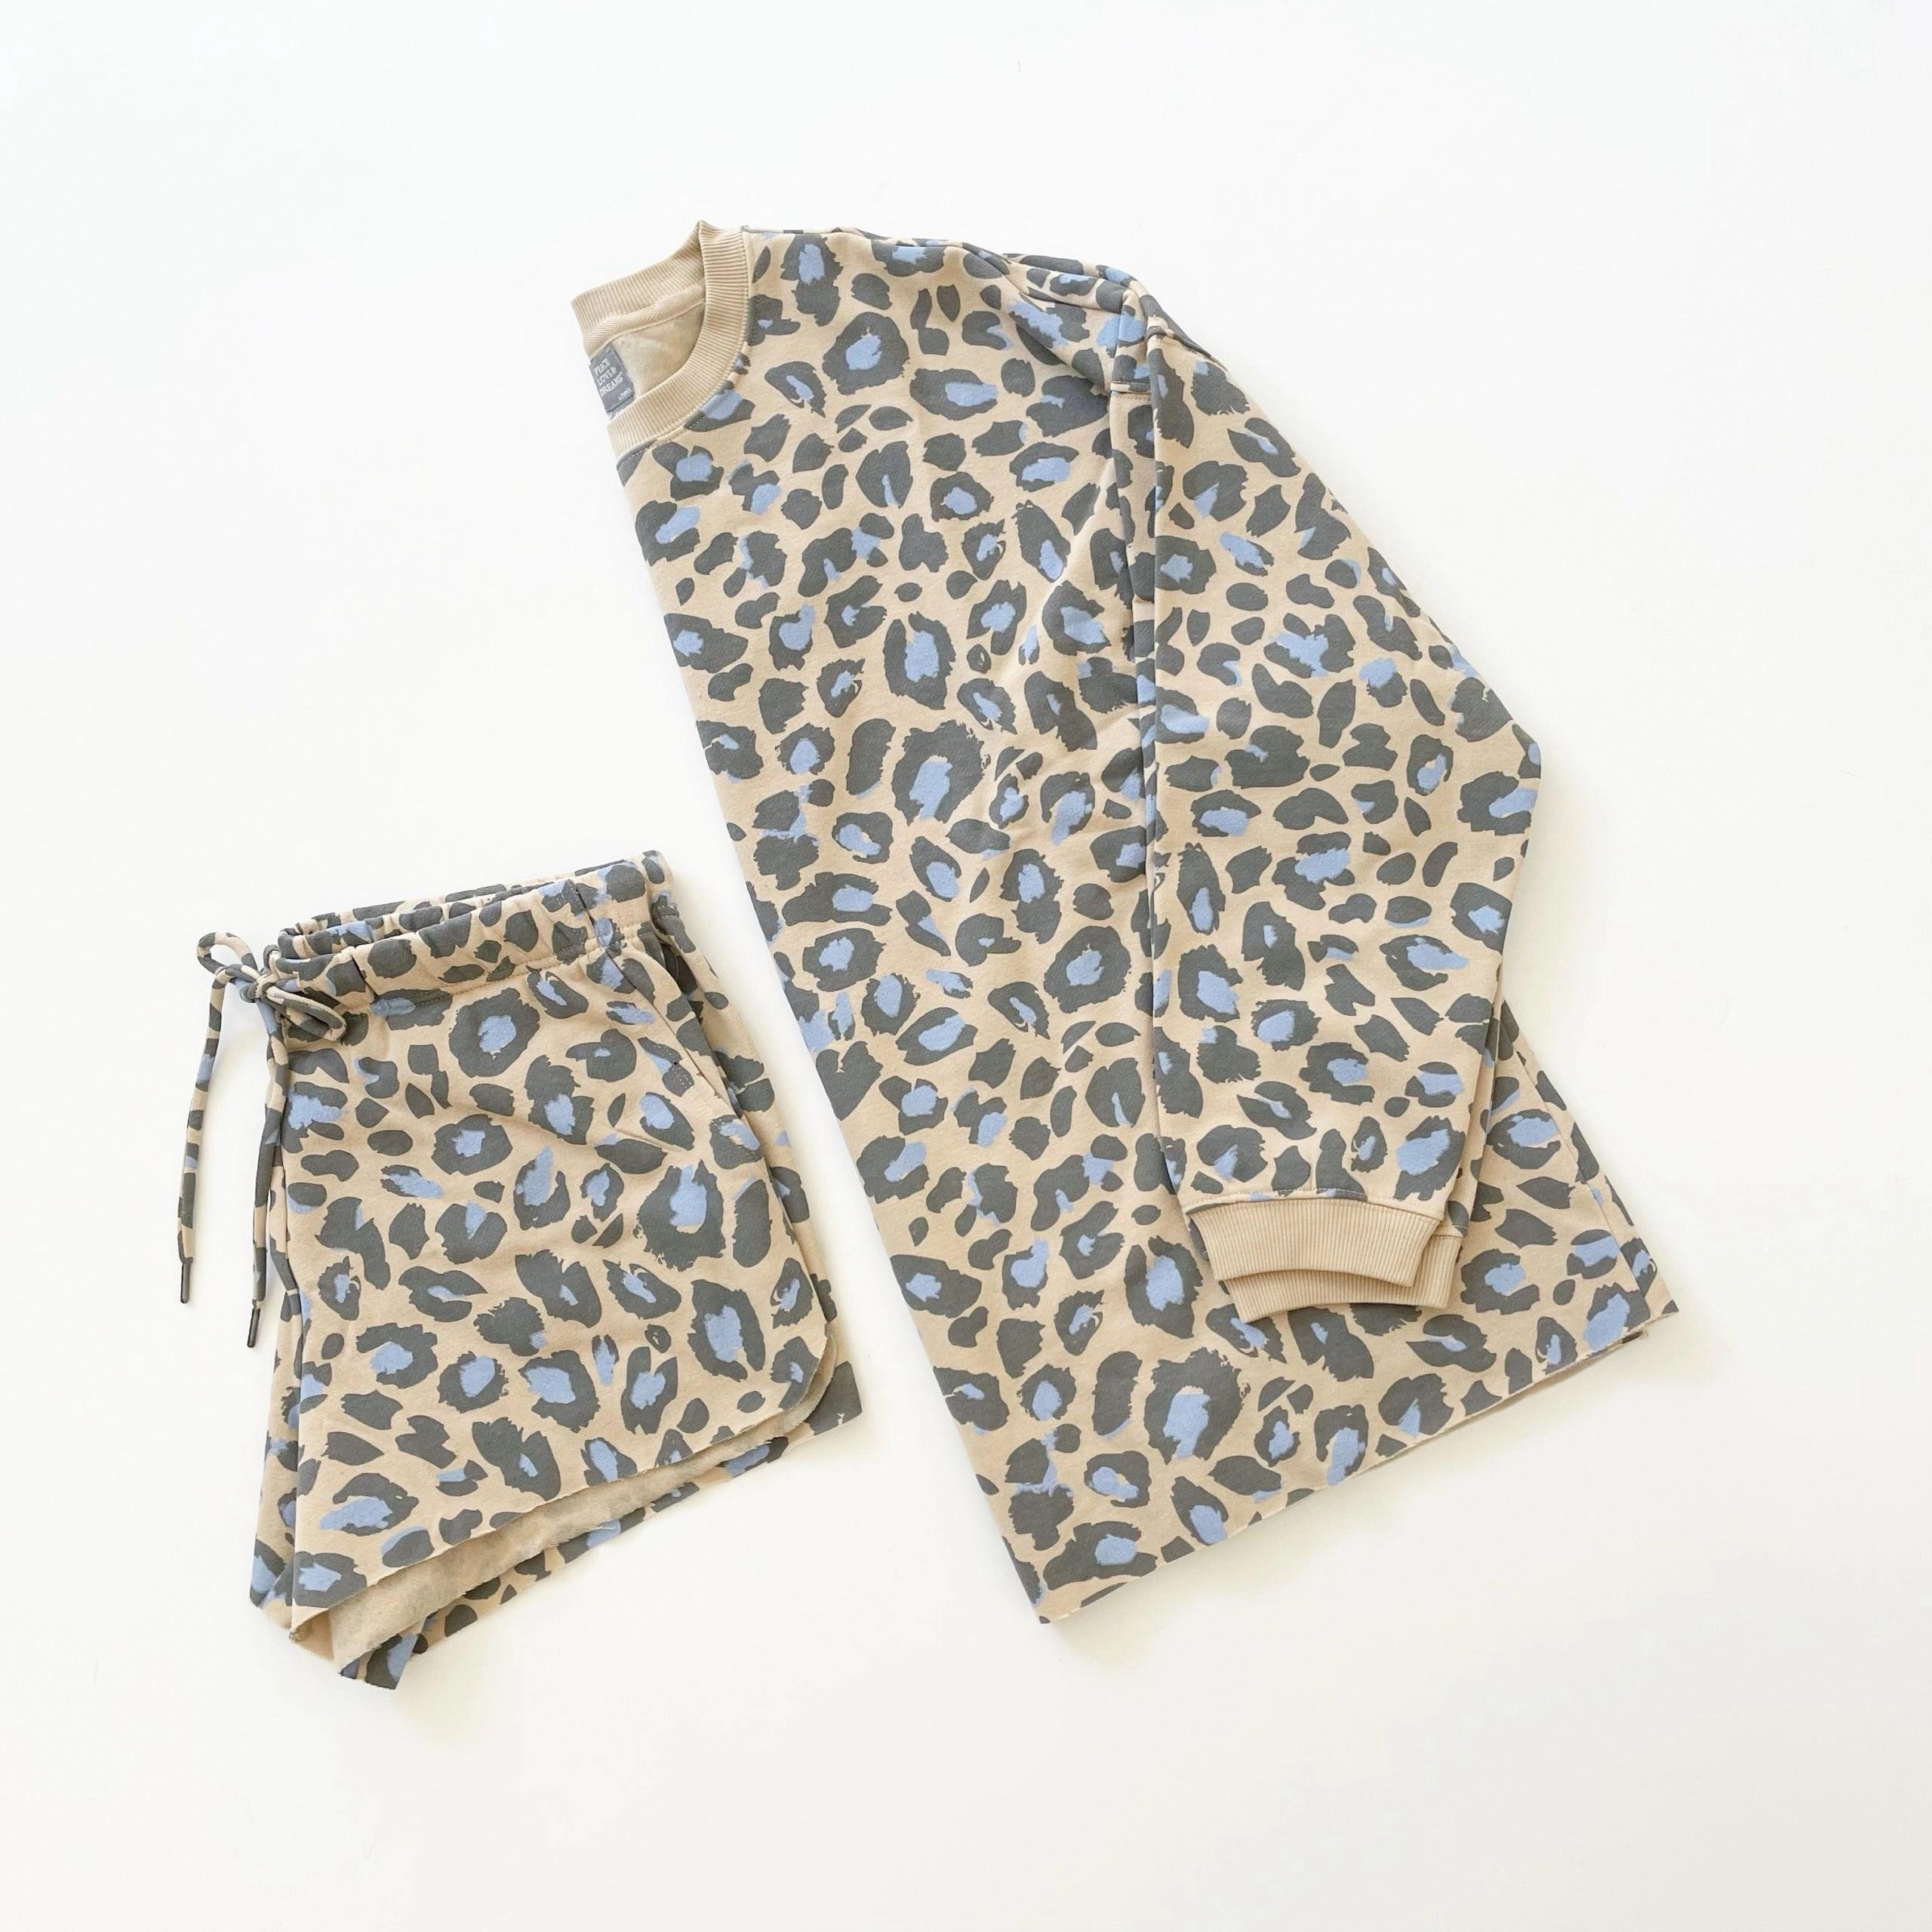 Peace, Love & Dreams Fleece earthen khaki and blue leopard print Sweatshirt and Shorts